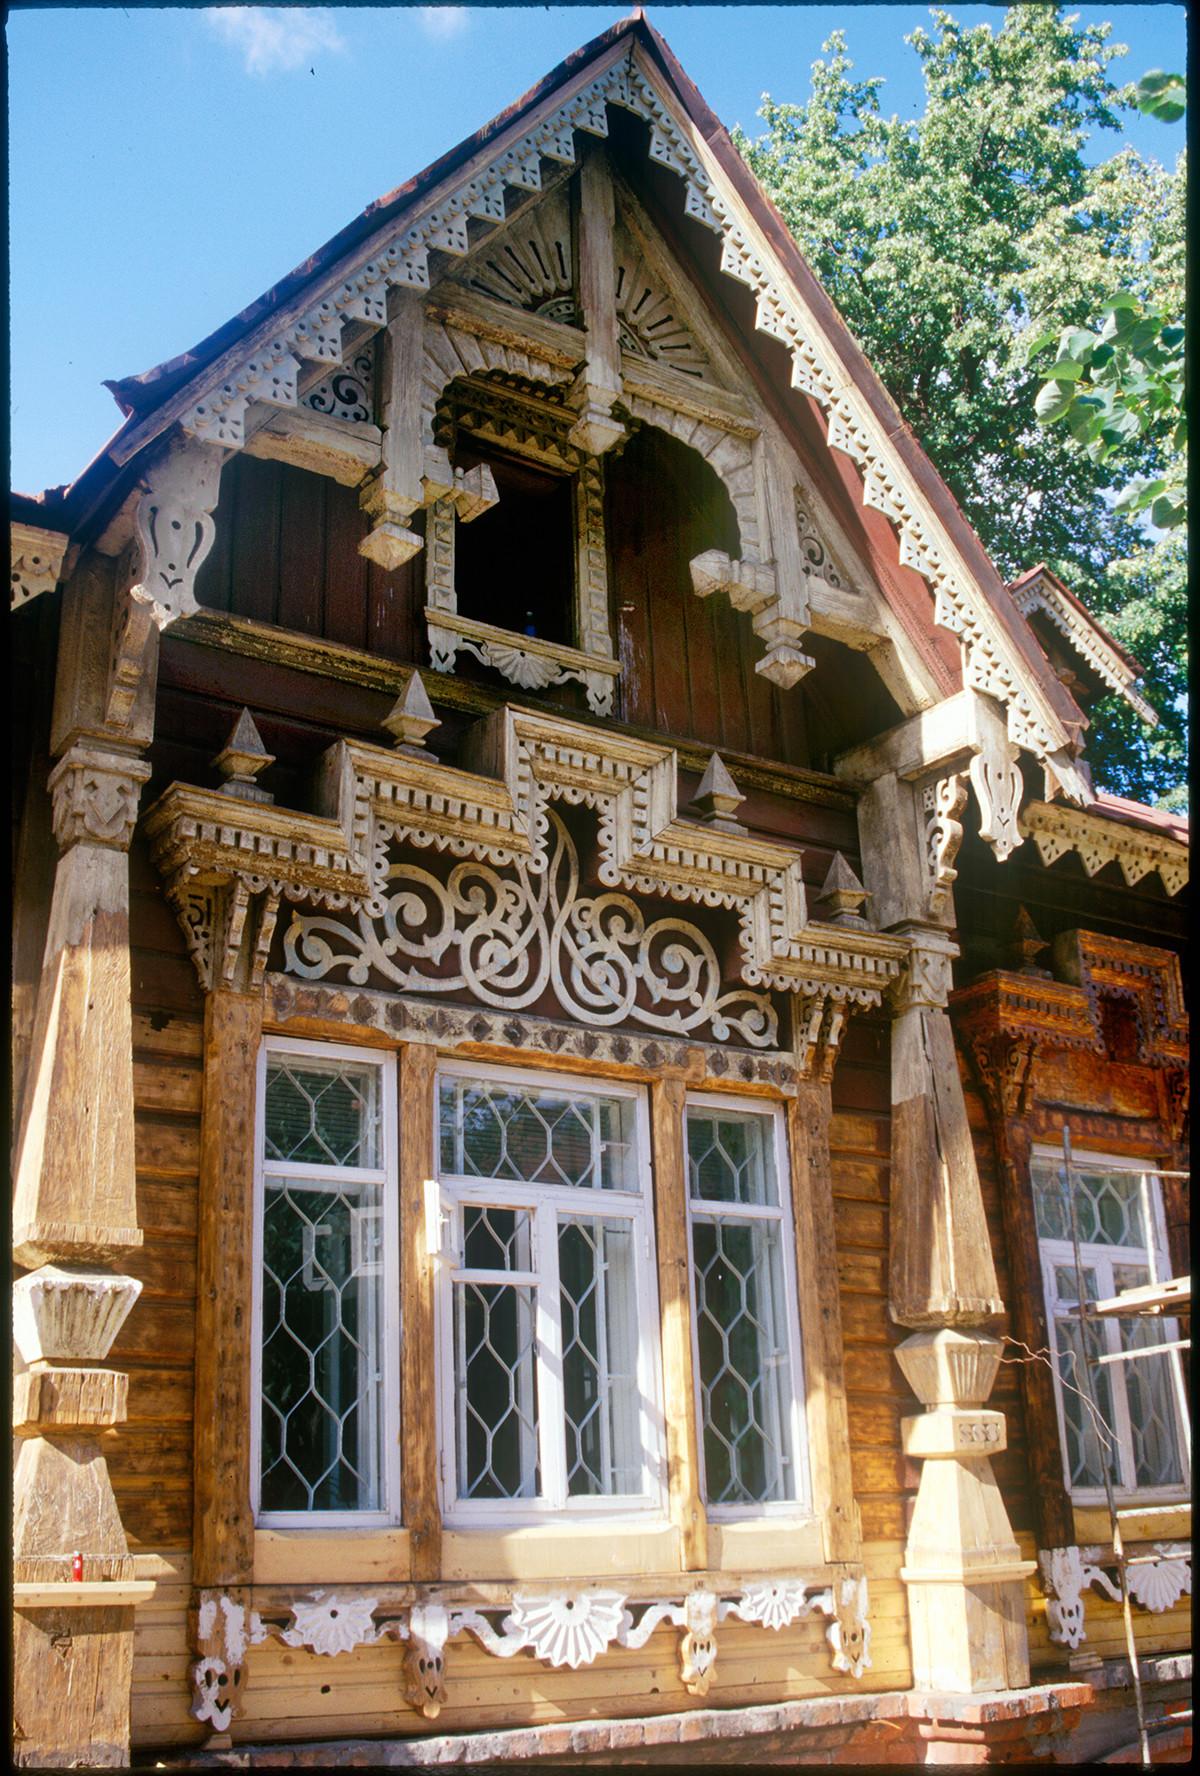 Tokarev House. Main facade, window detail. August 23, 1999